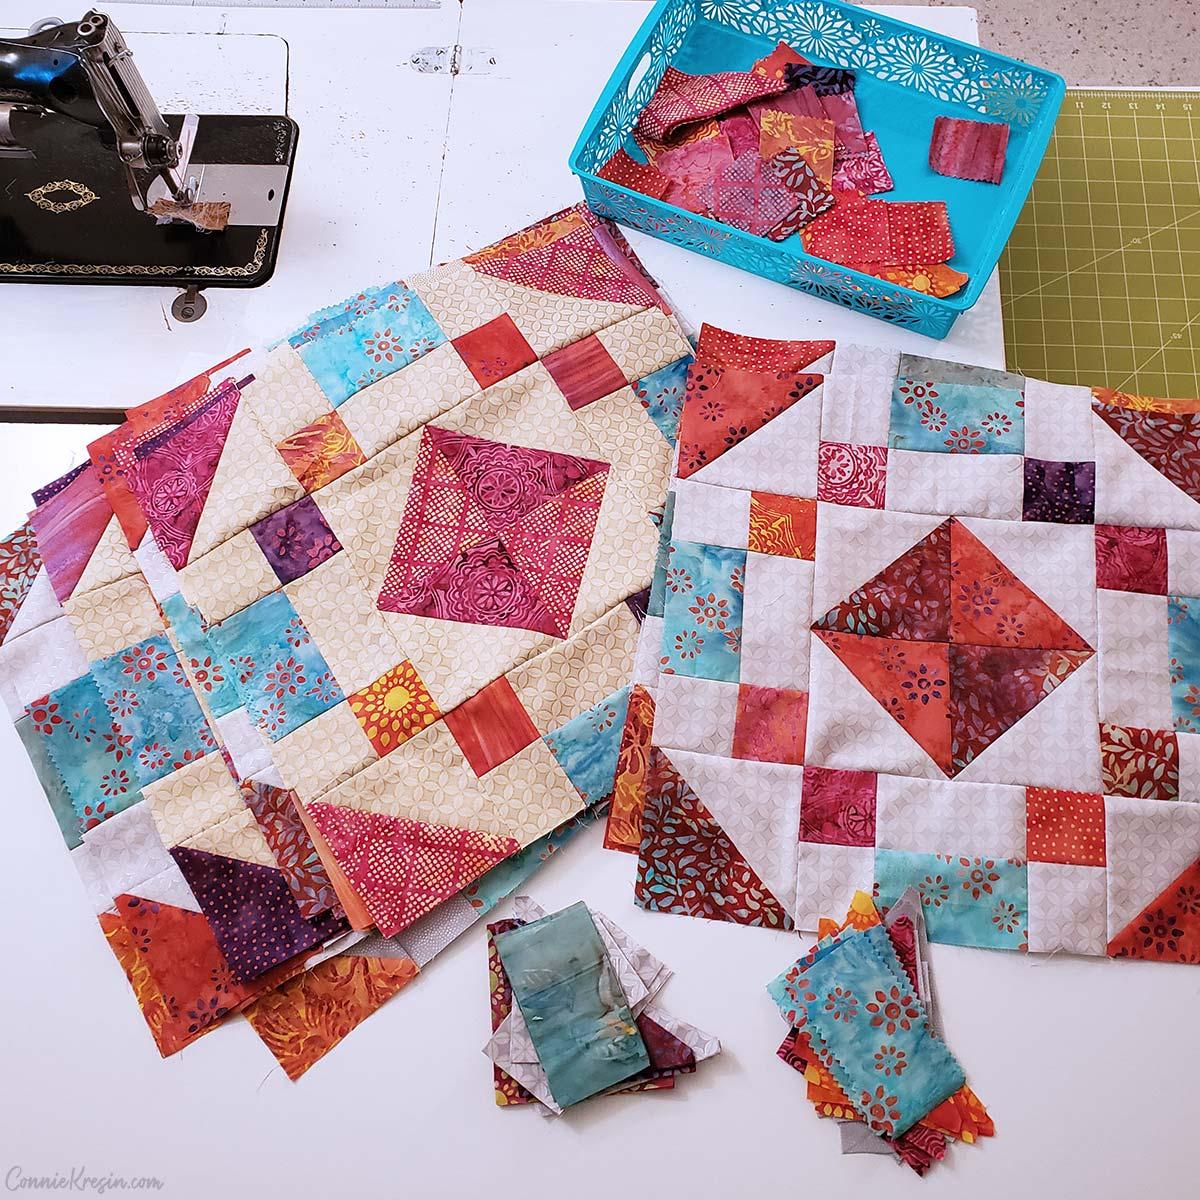 Working on batik quilt blocks